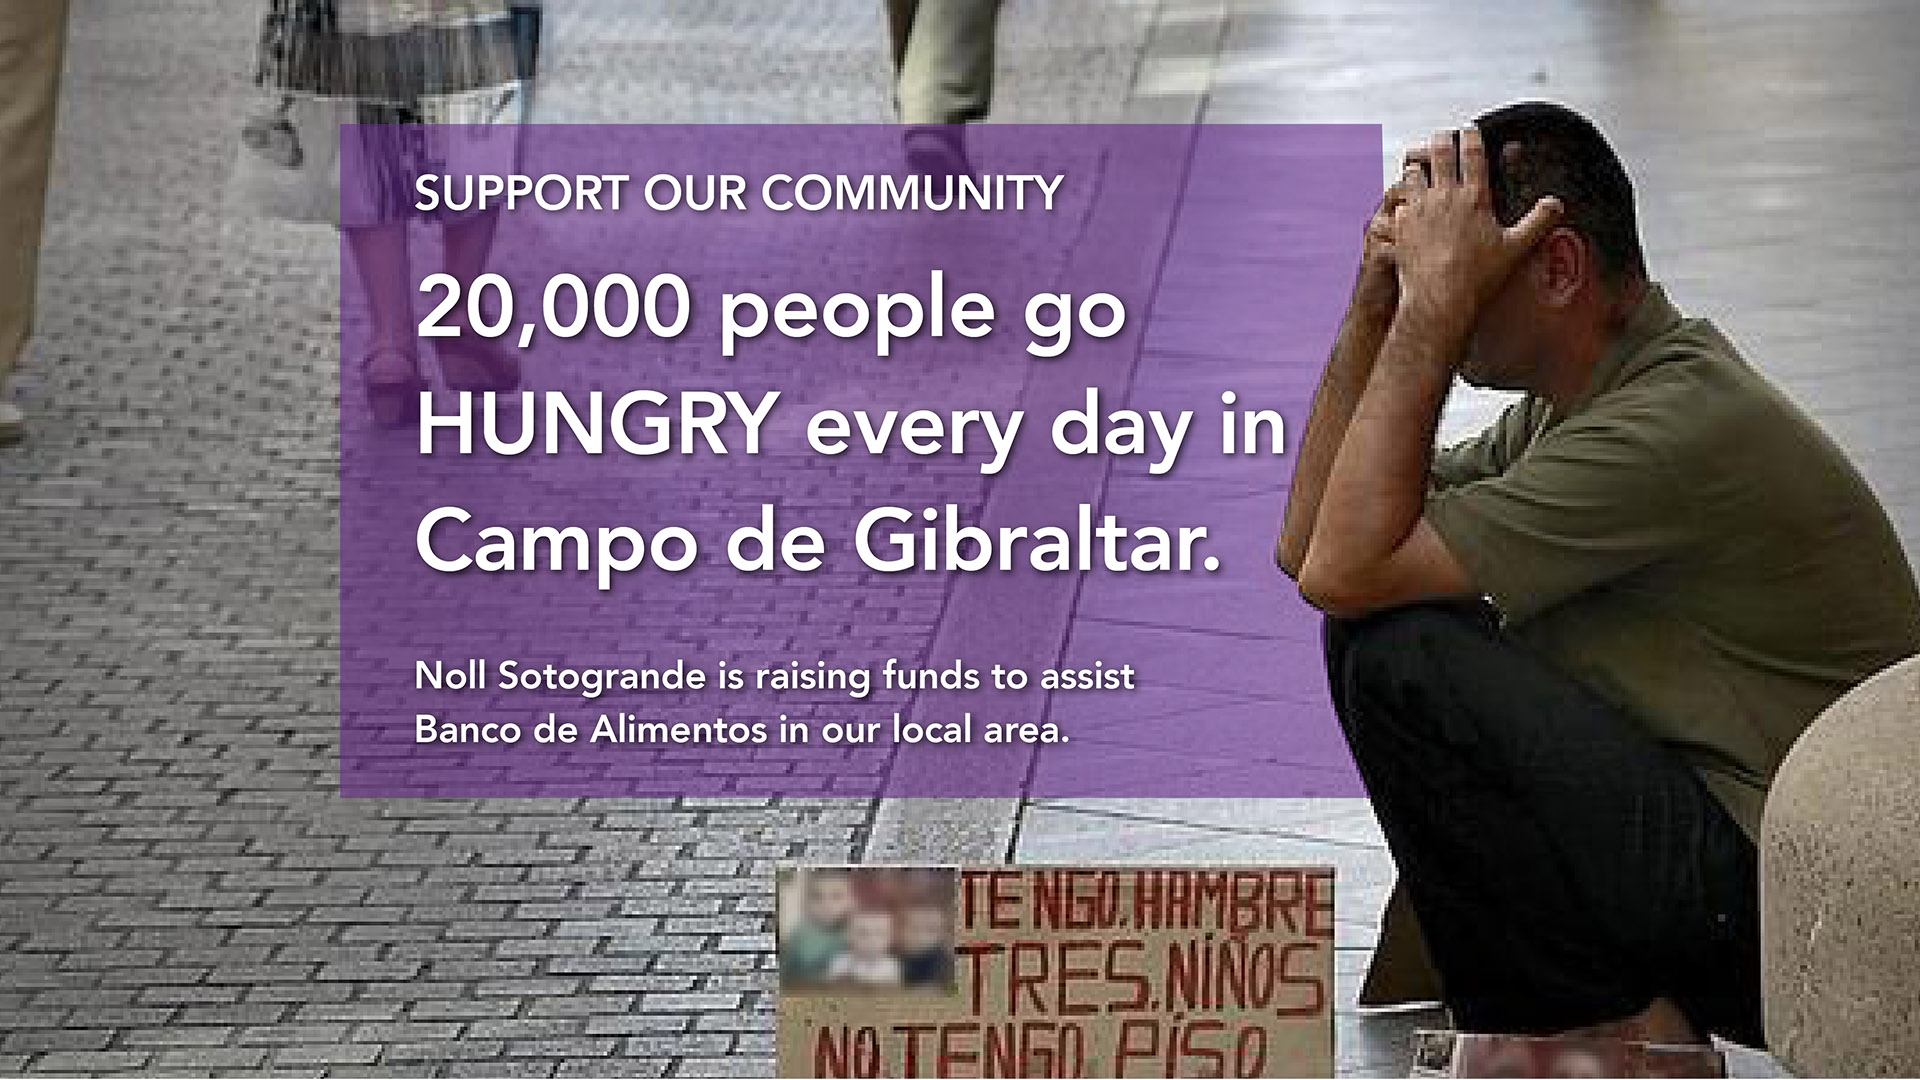 banner-charity-support-banco-alimentos-campo-gibraltar-noll-sotogrande-real-estate-2021-V2